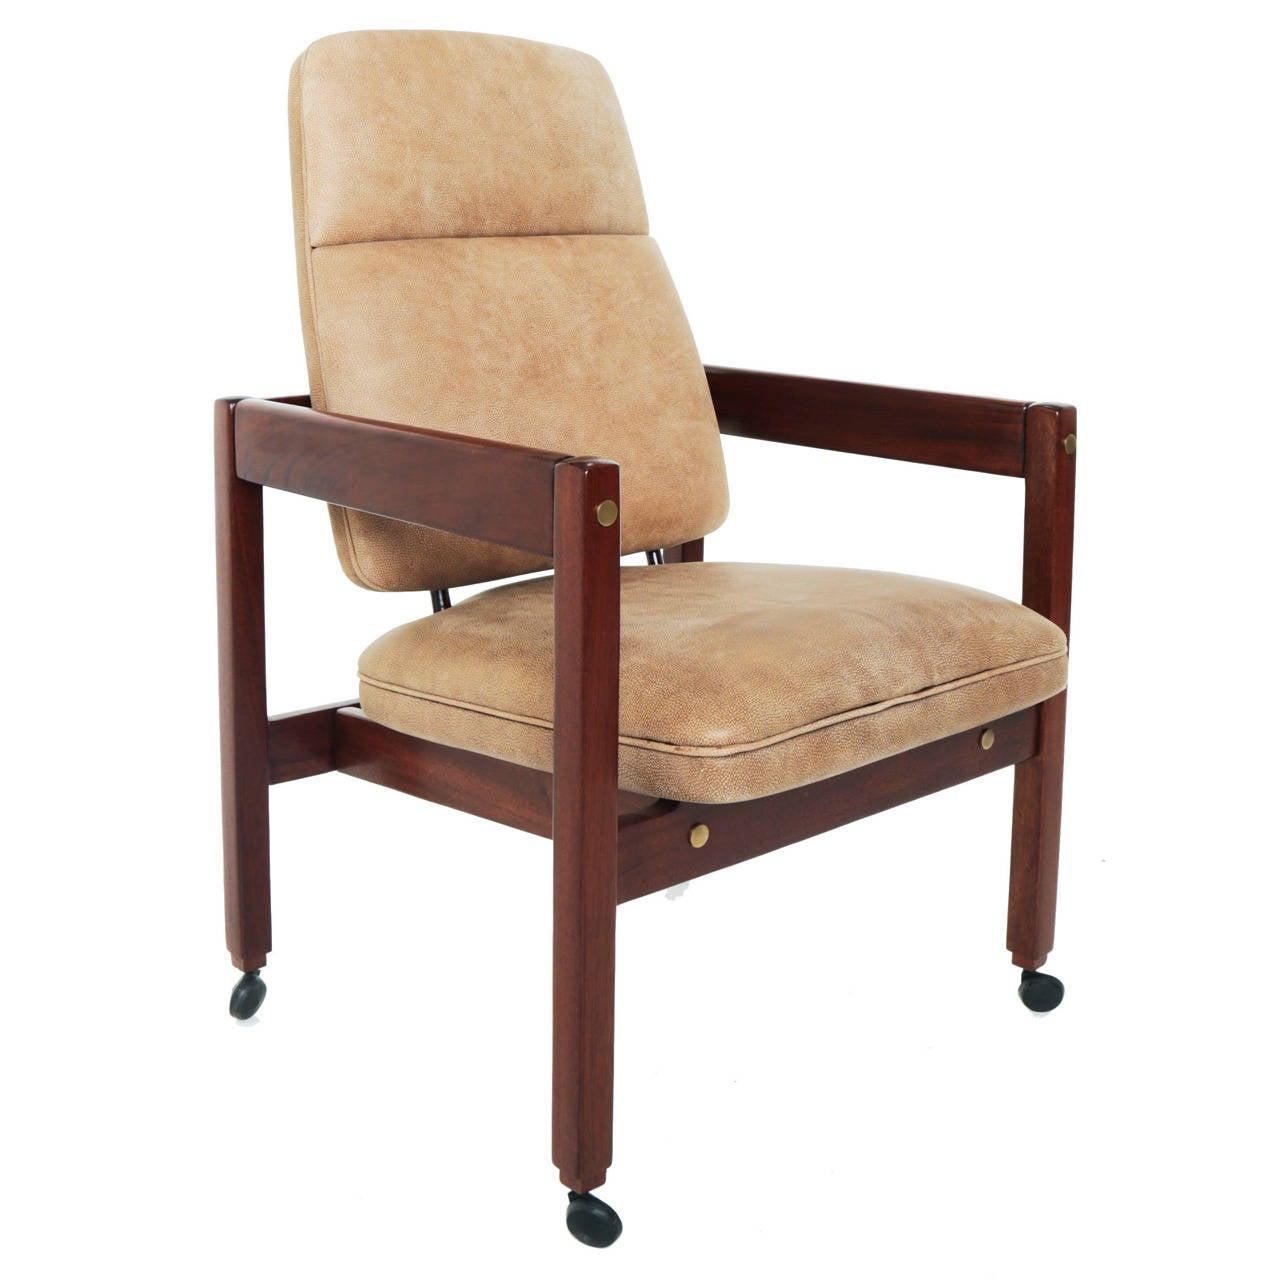 "High-Back ""Kiko"" Armchair Desk Chair by Sergio Rodrigues"